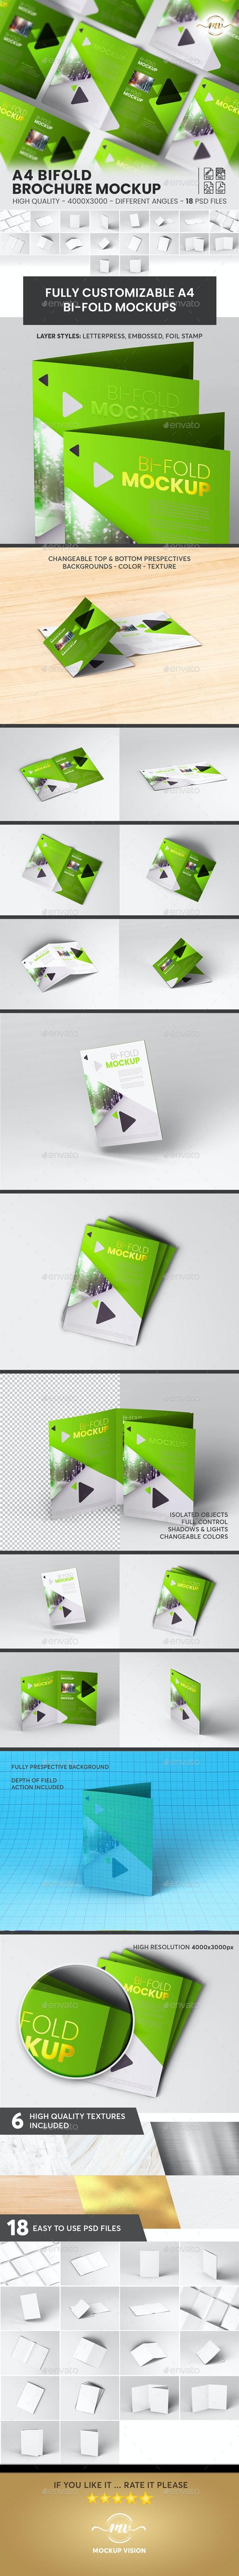 A4 Bifold, Brochure Mockup V3 - Brochures Print